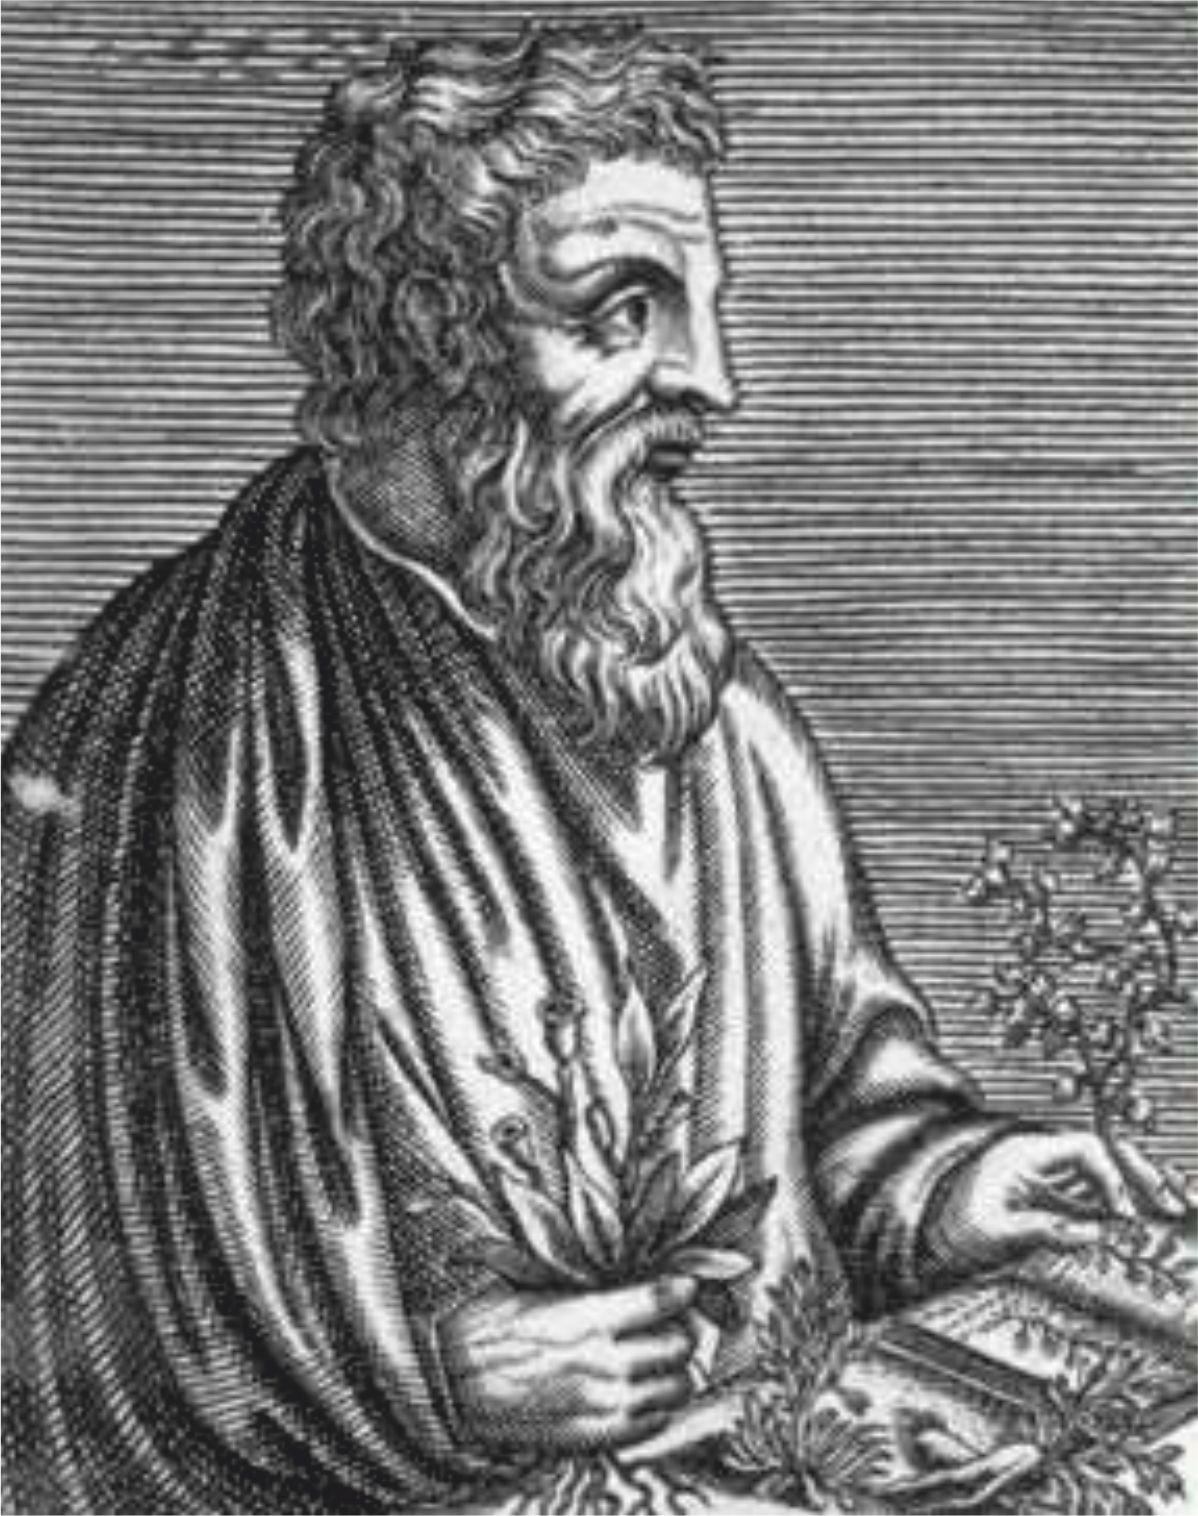 Dioscorides Pedanius